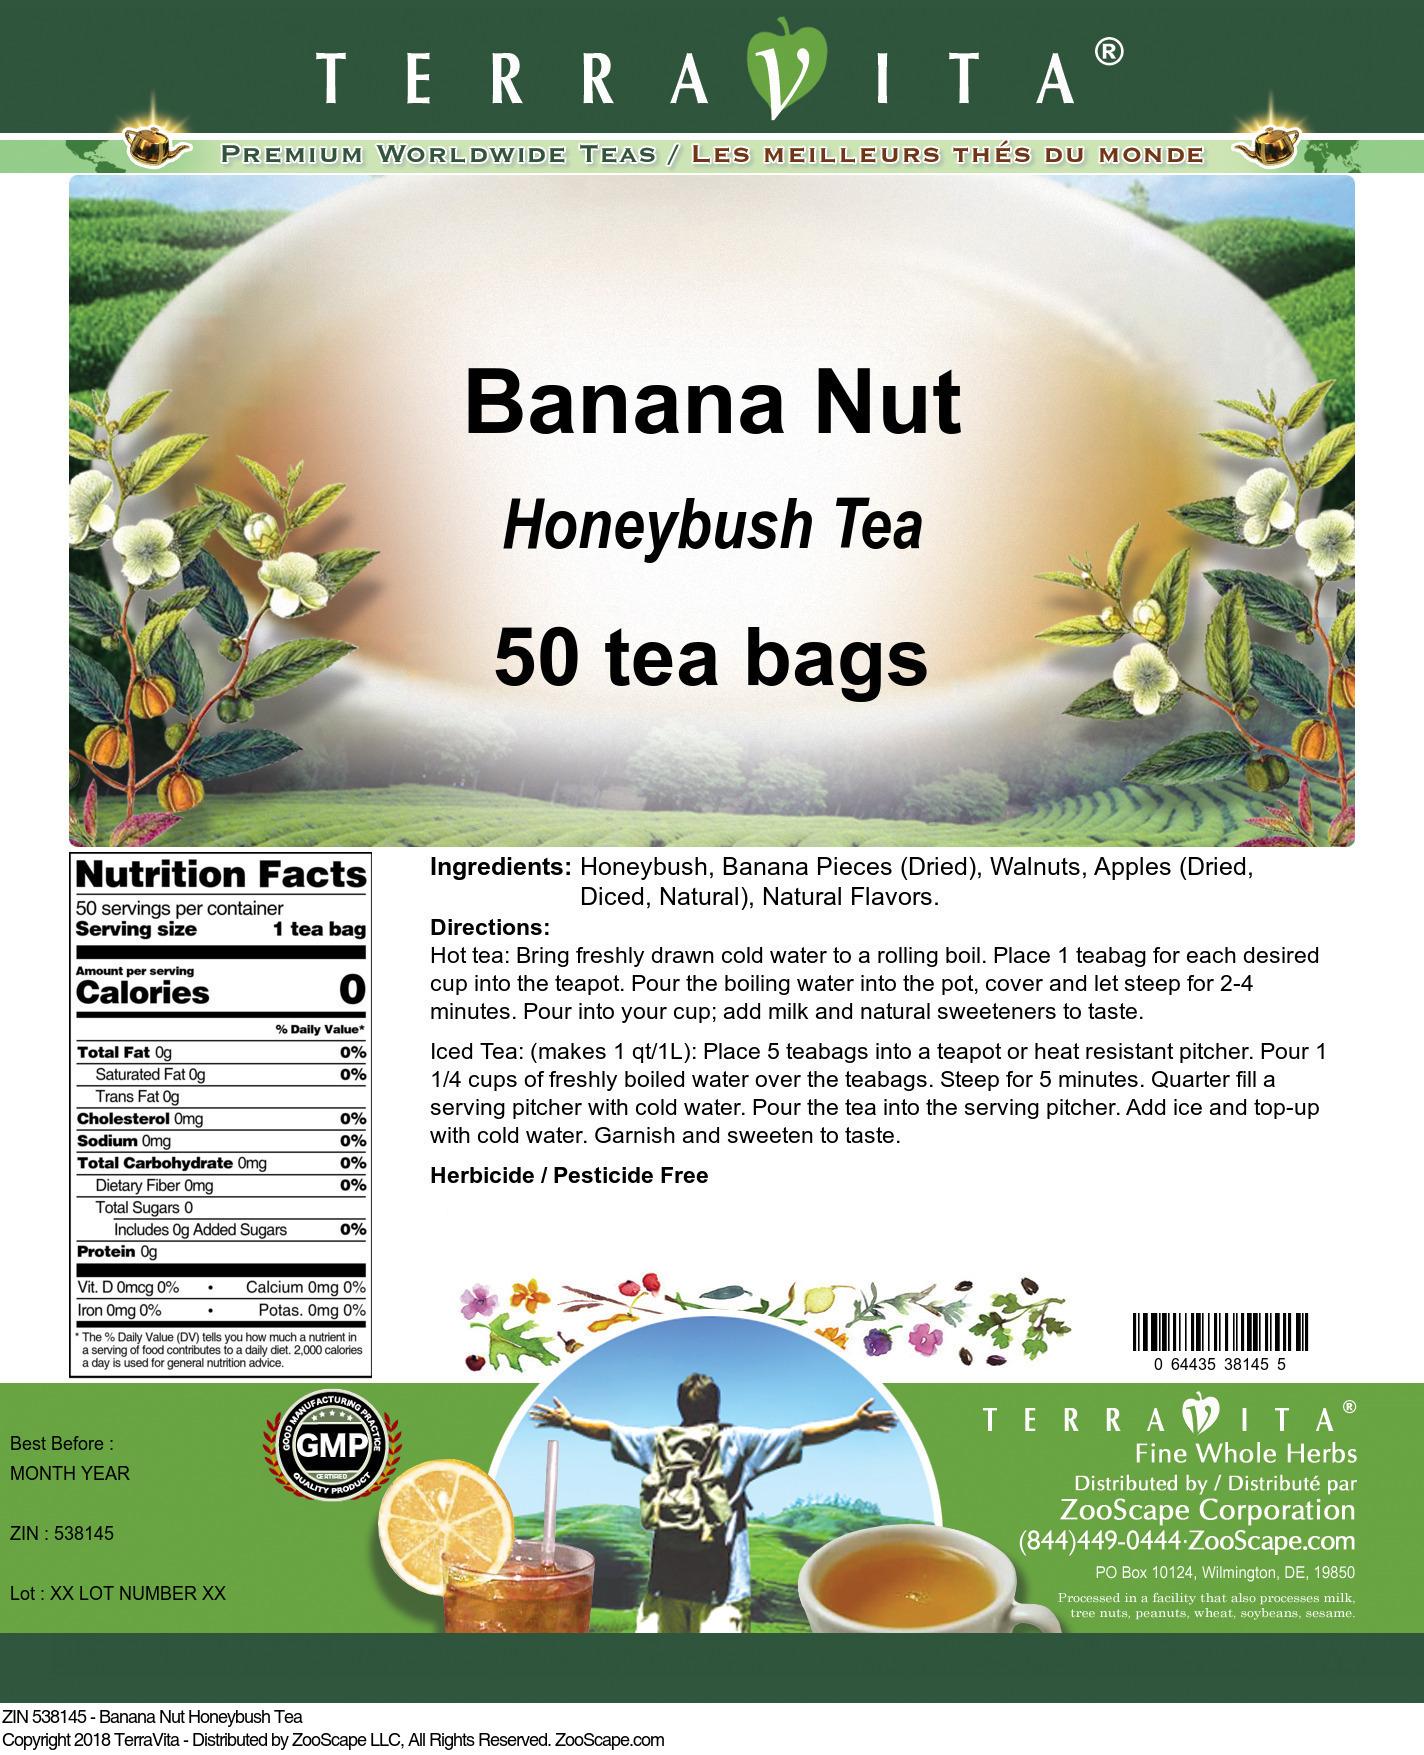 Banana Nut Honeybush Tea